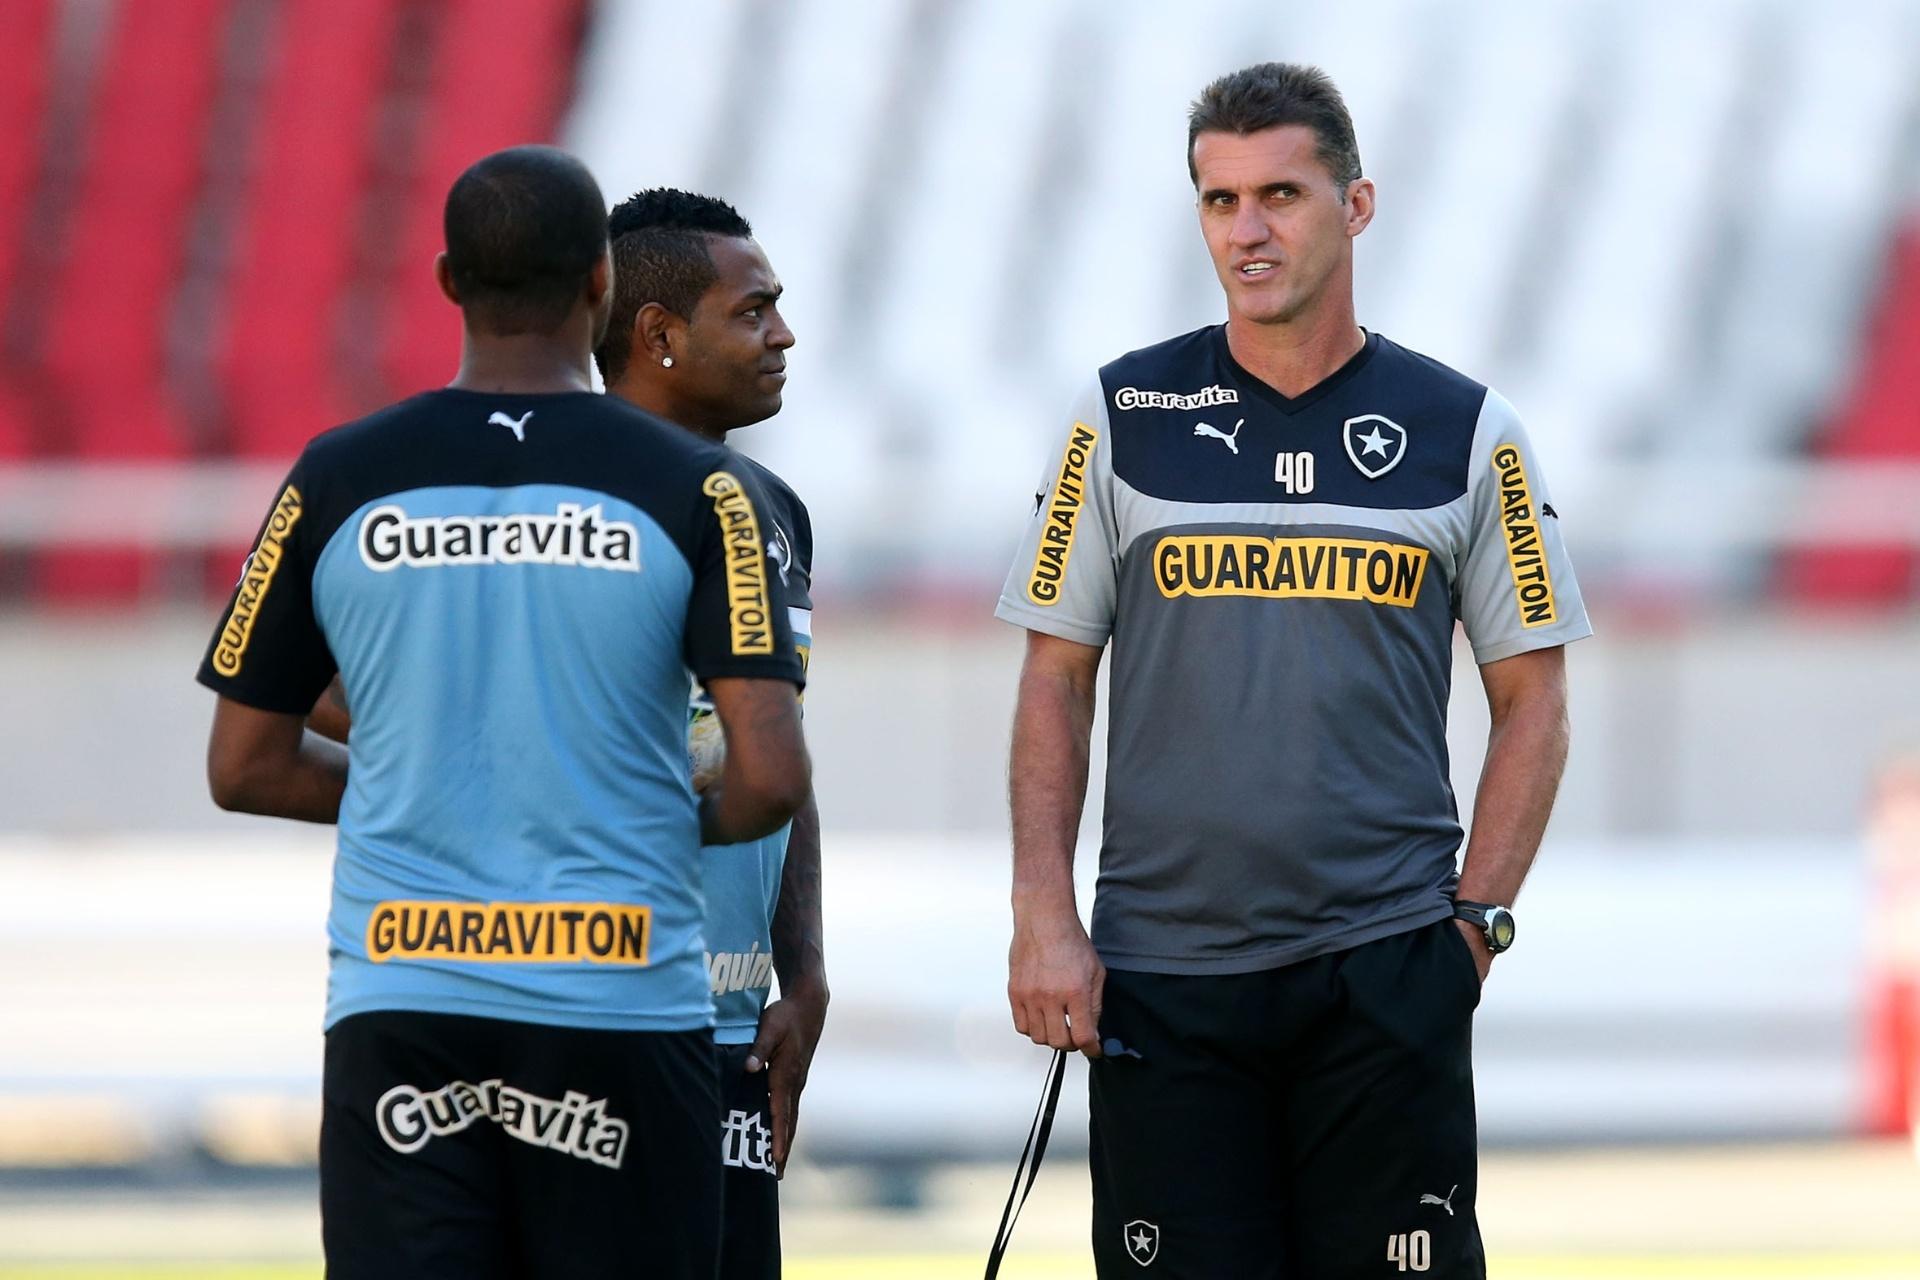 Jobson falta a treino para discutir defesa no STJD  Botafogo minimiza caso  - 26 11 2014 - UOL Esporte 9d4d5454f1407